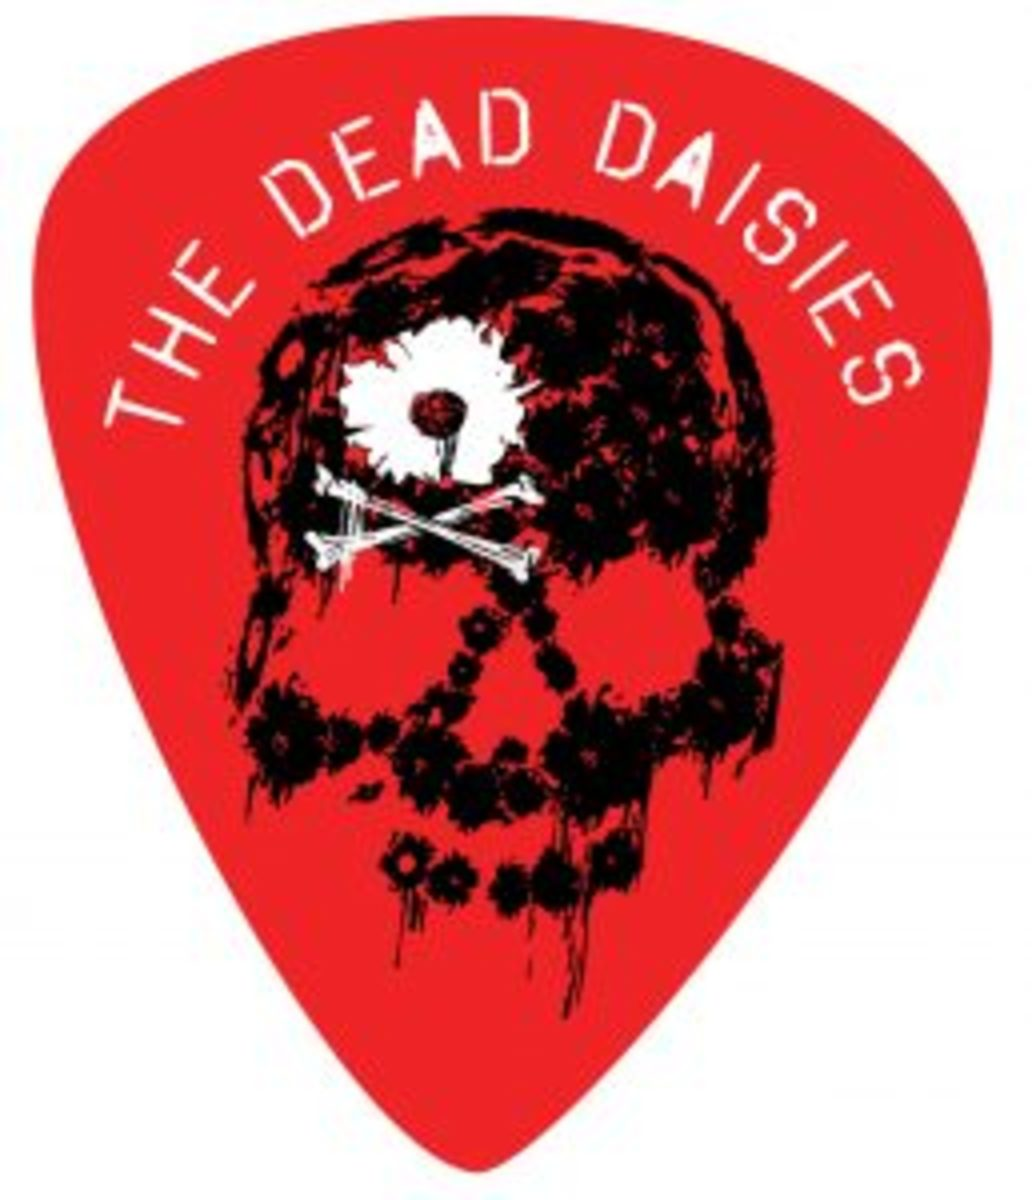 A Dead Daises guitar pick.